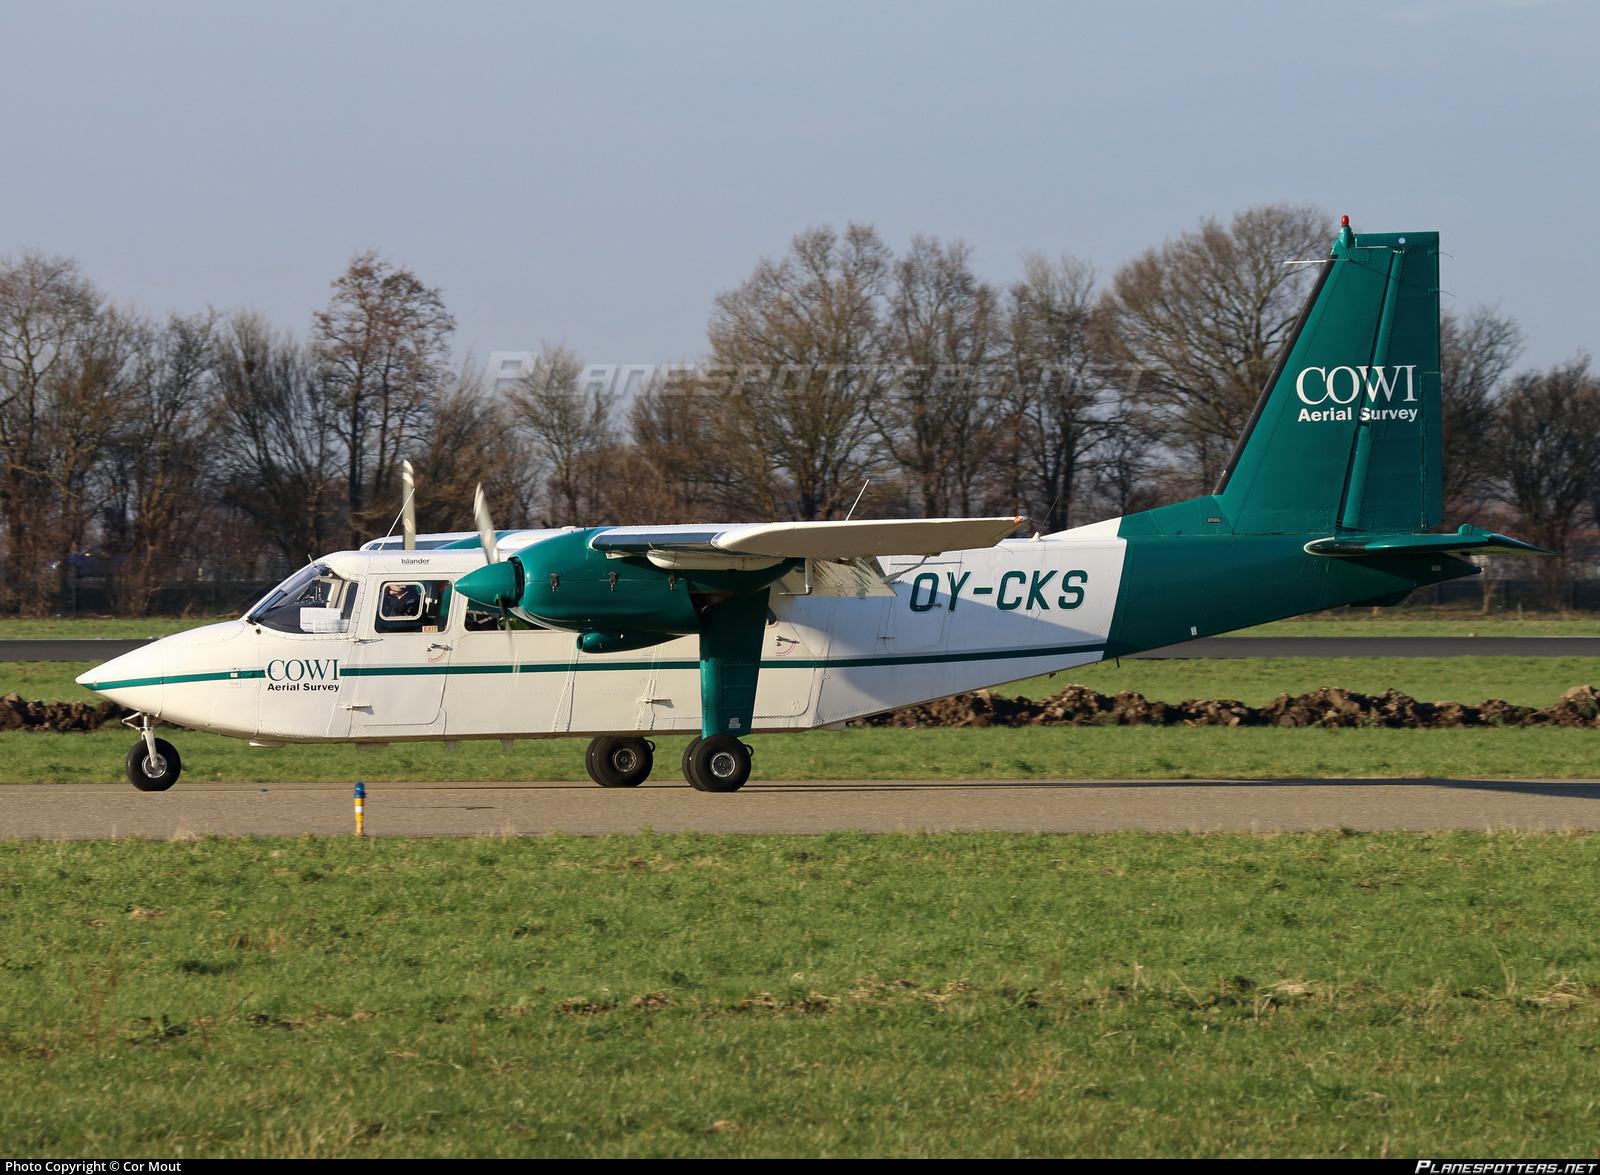 OY-CKS Cowi Aerial Survey Britten-Norman BN-2A-21 Islander Photo by